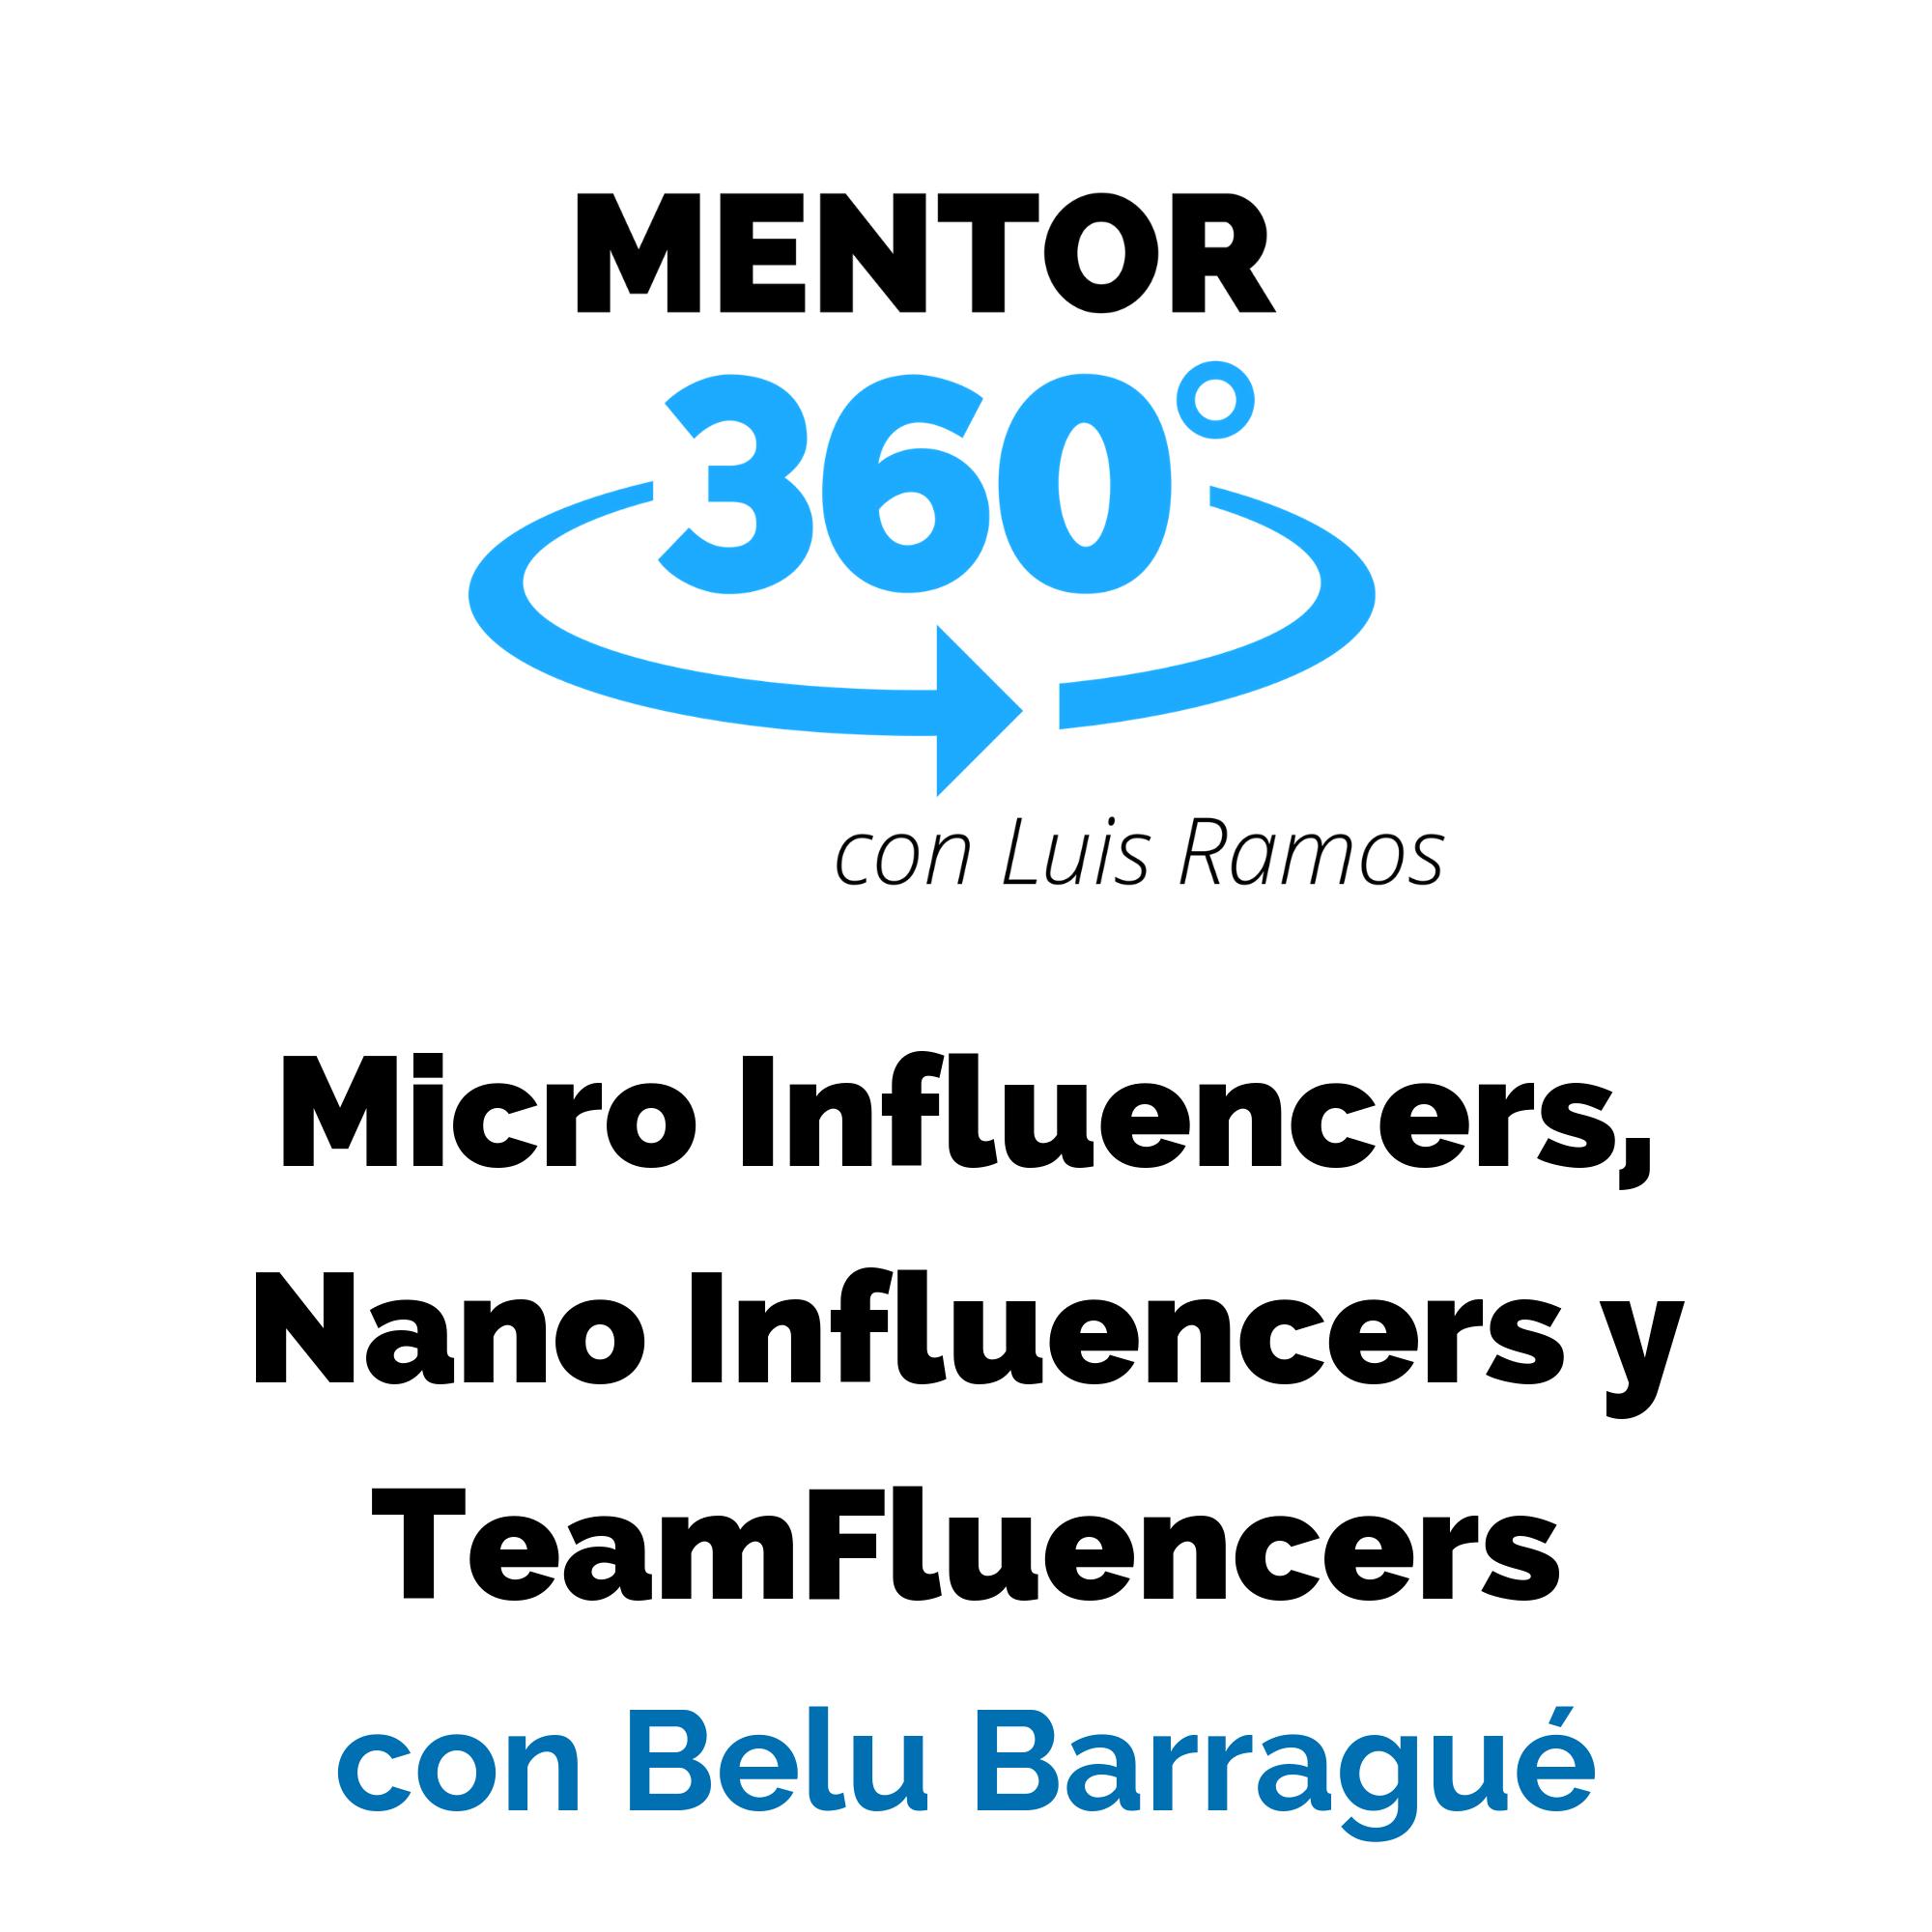 Micro Influencers, Nano Influencers y TeamFluencers, con Belu Barragué - Redes Sociales - MENTOR360